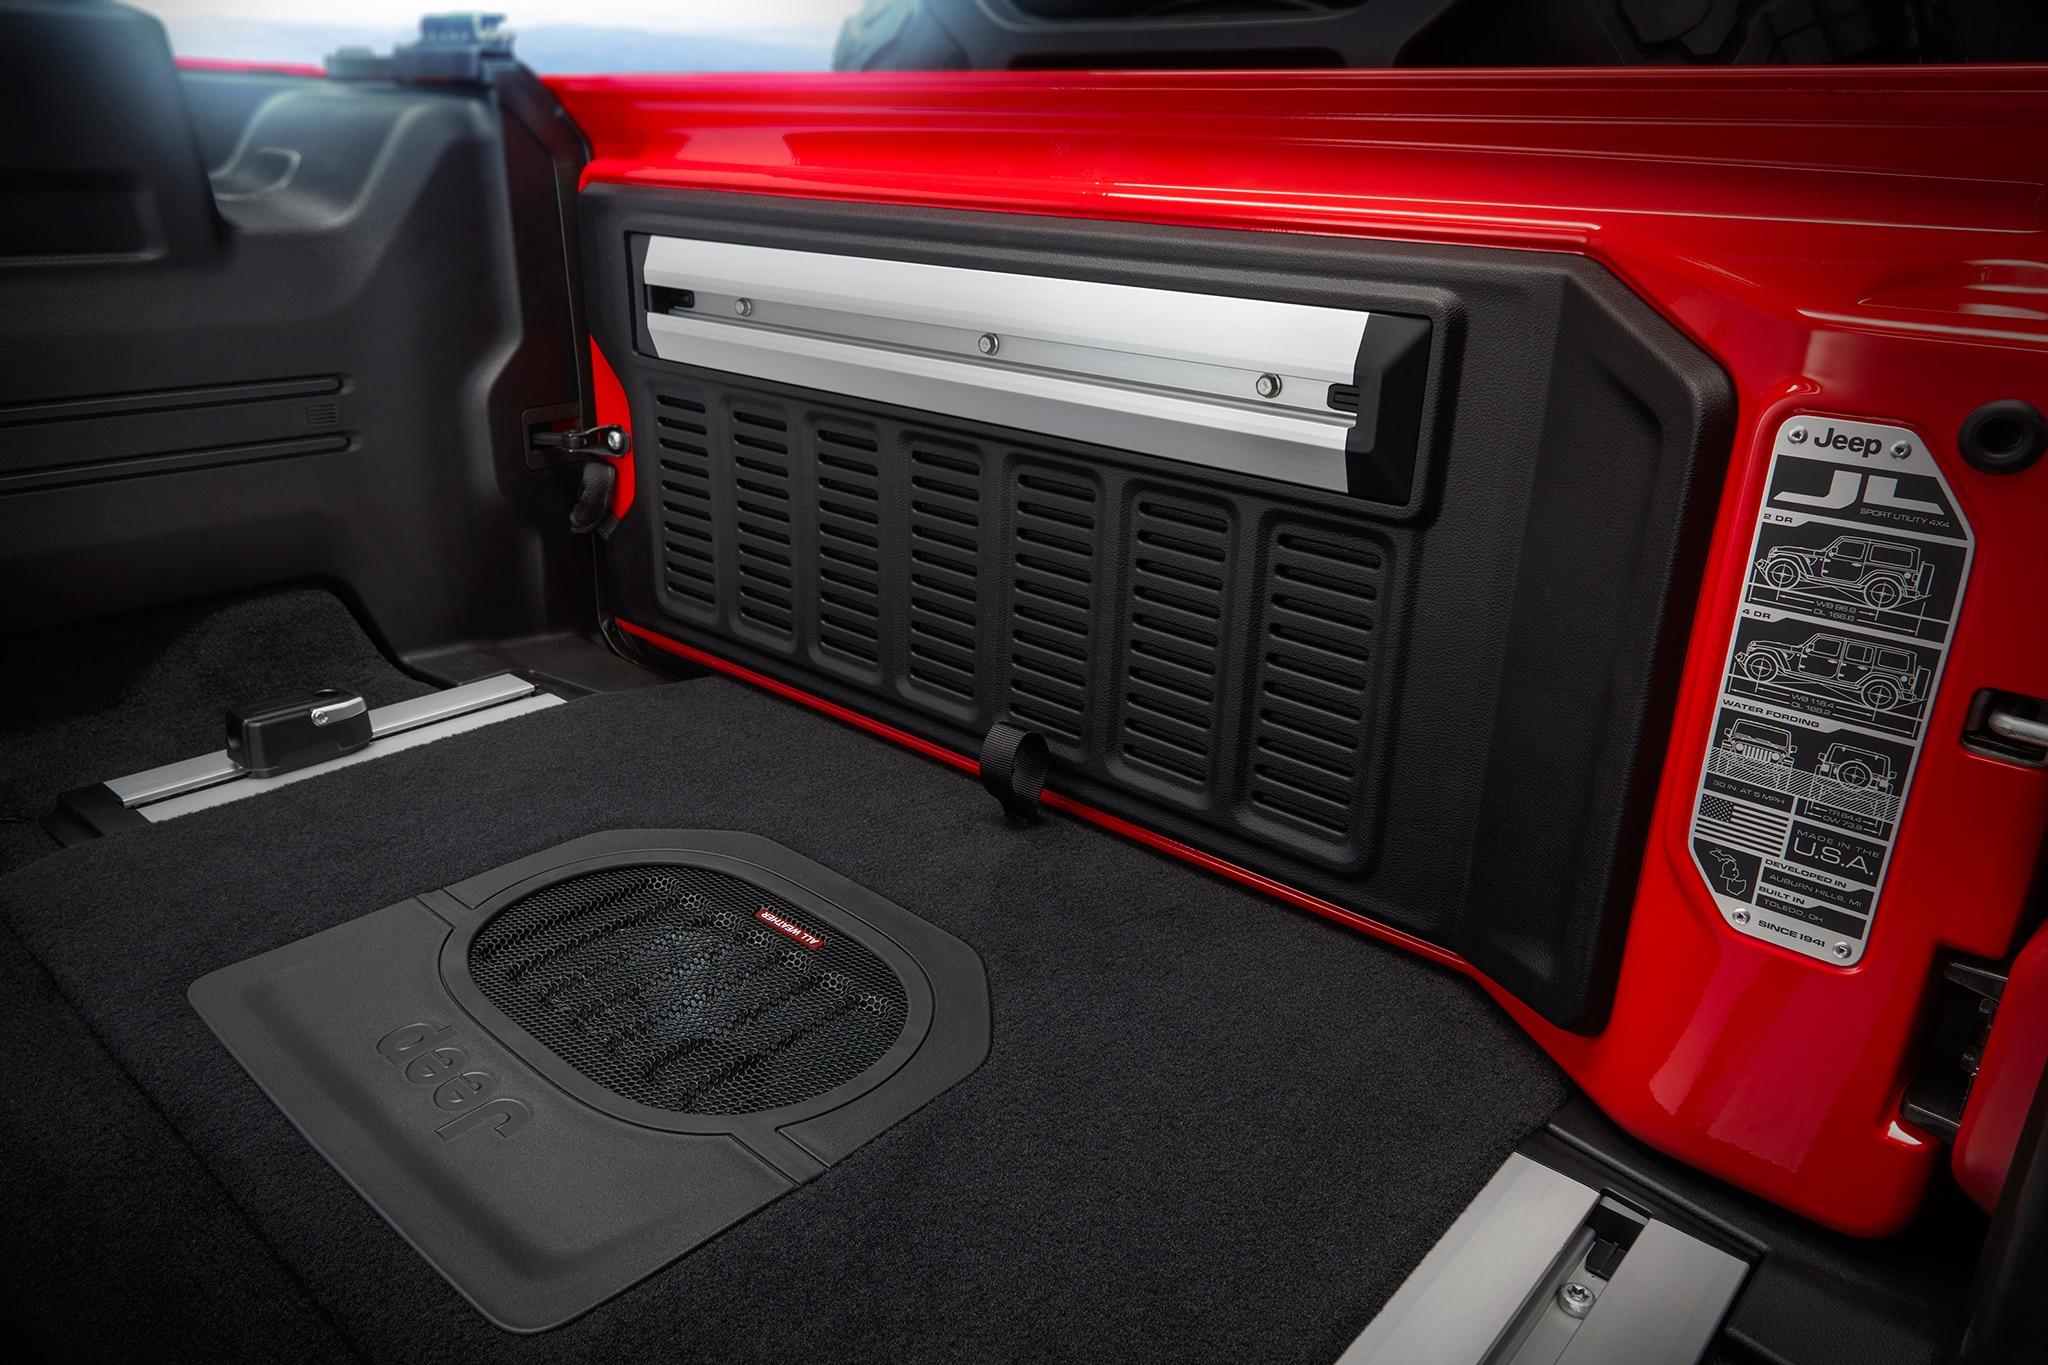 Mopar Introduces 2018 Jeep Wrangler Parts At Sema